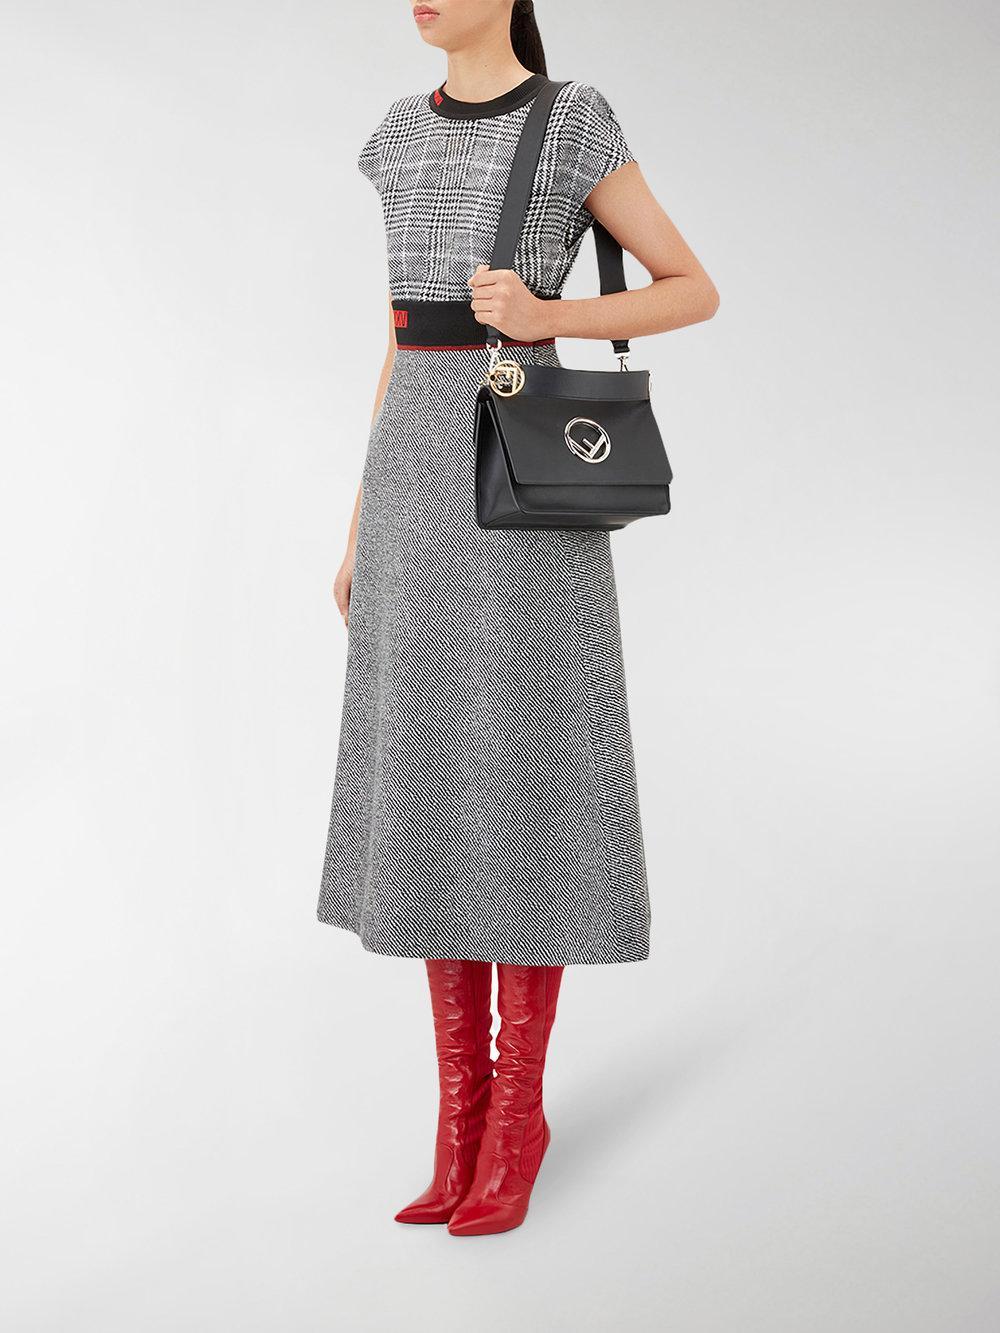 Fendi - Black Kani Shoulder Bag - Lyst. View fullscreen 9e53236c1bce4